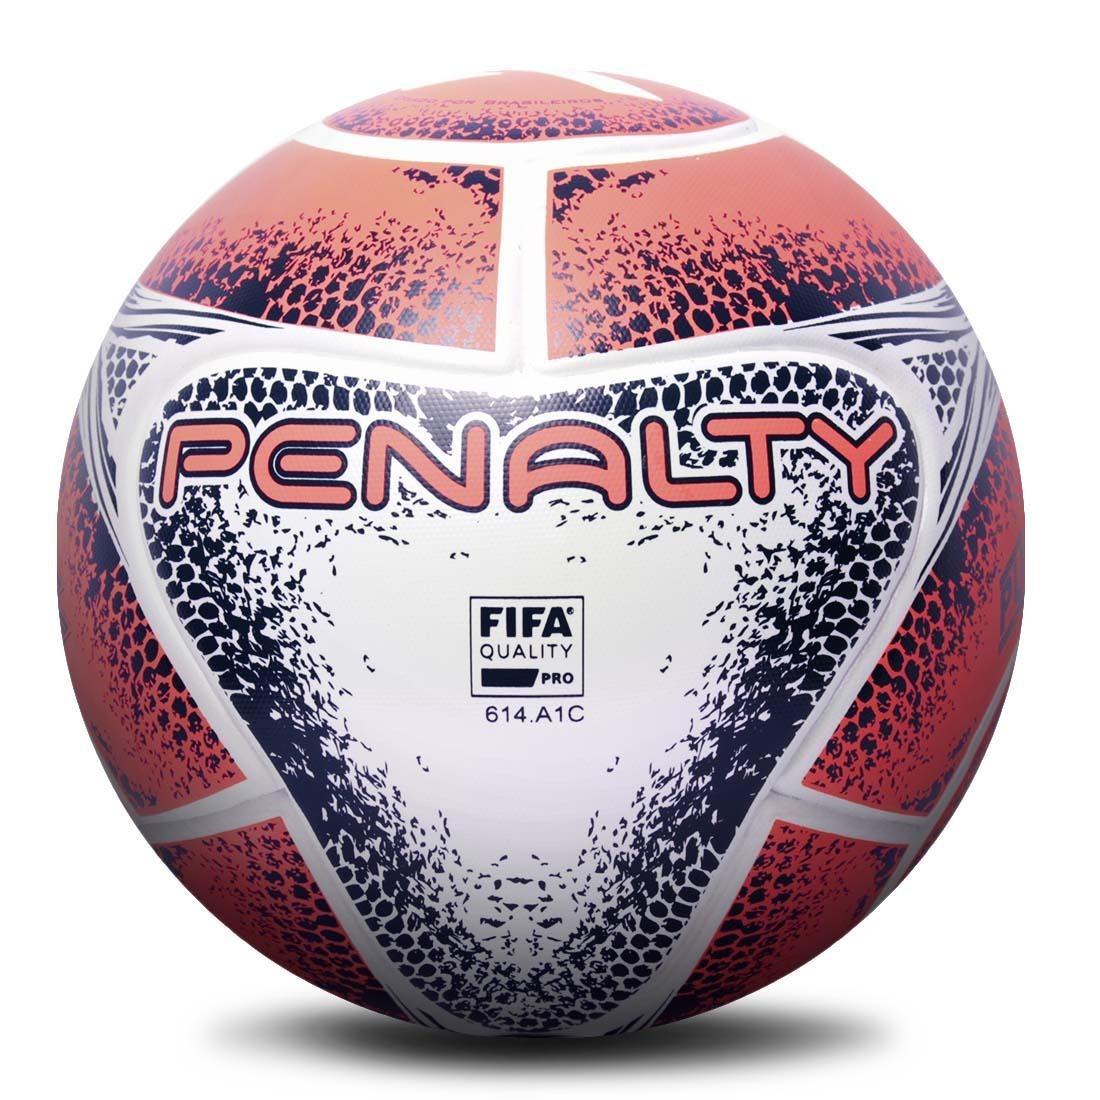 300c3c7a7a Bola Futsal Penalty Max 1000 Aprovada Fifa 2018 Na Caixa - R  203